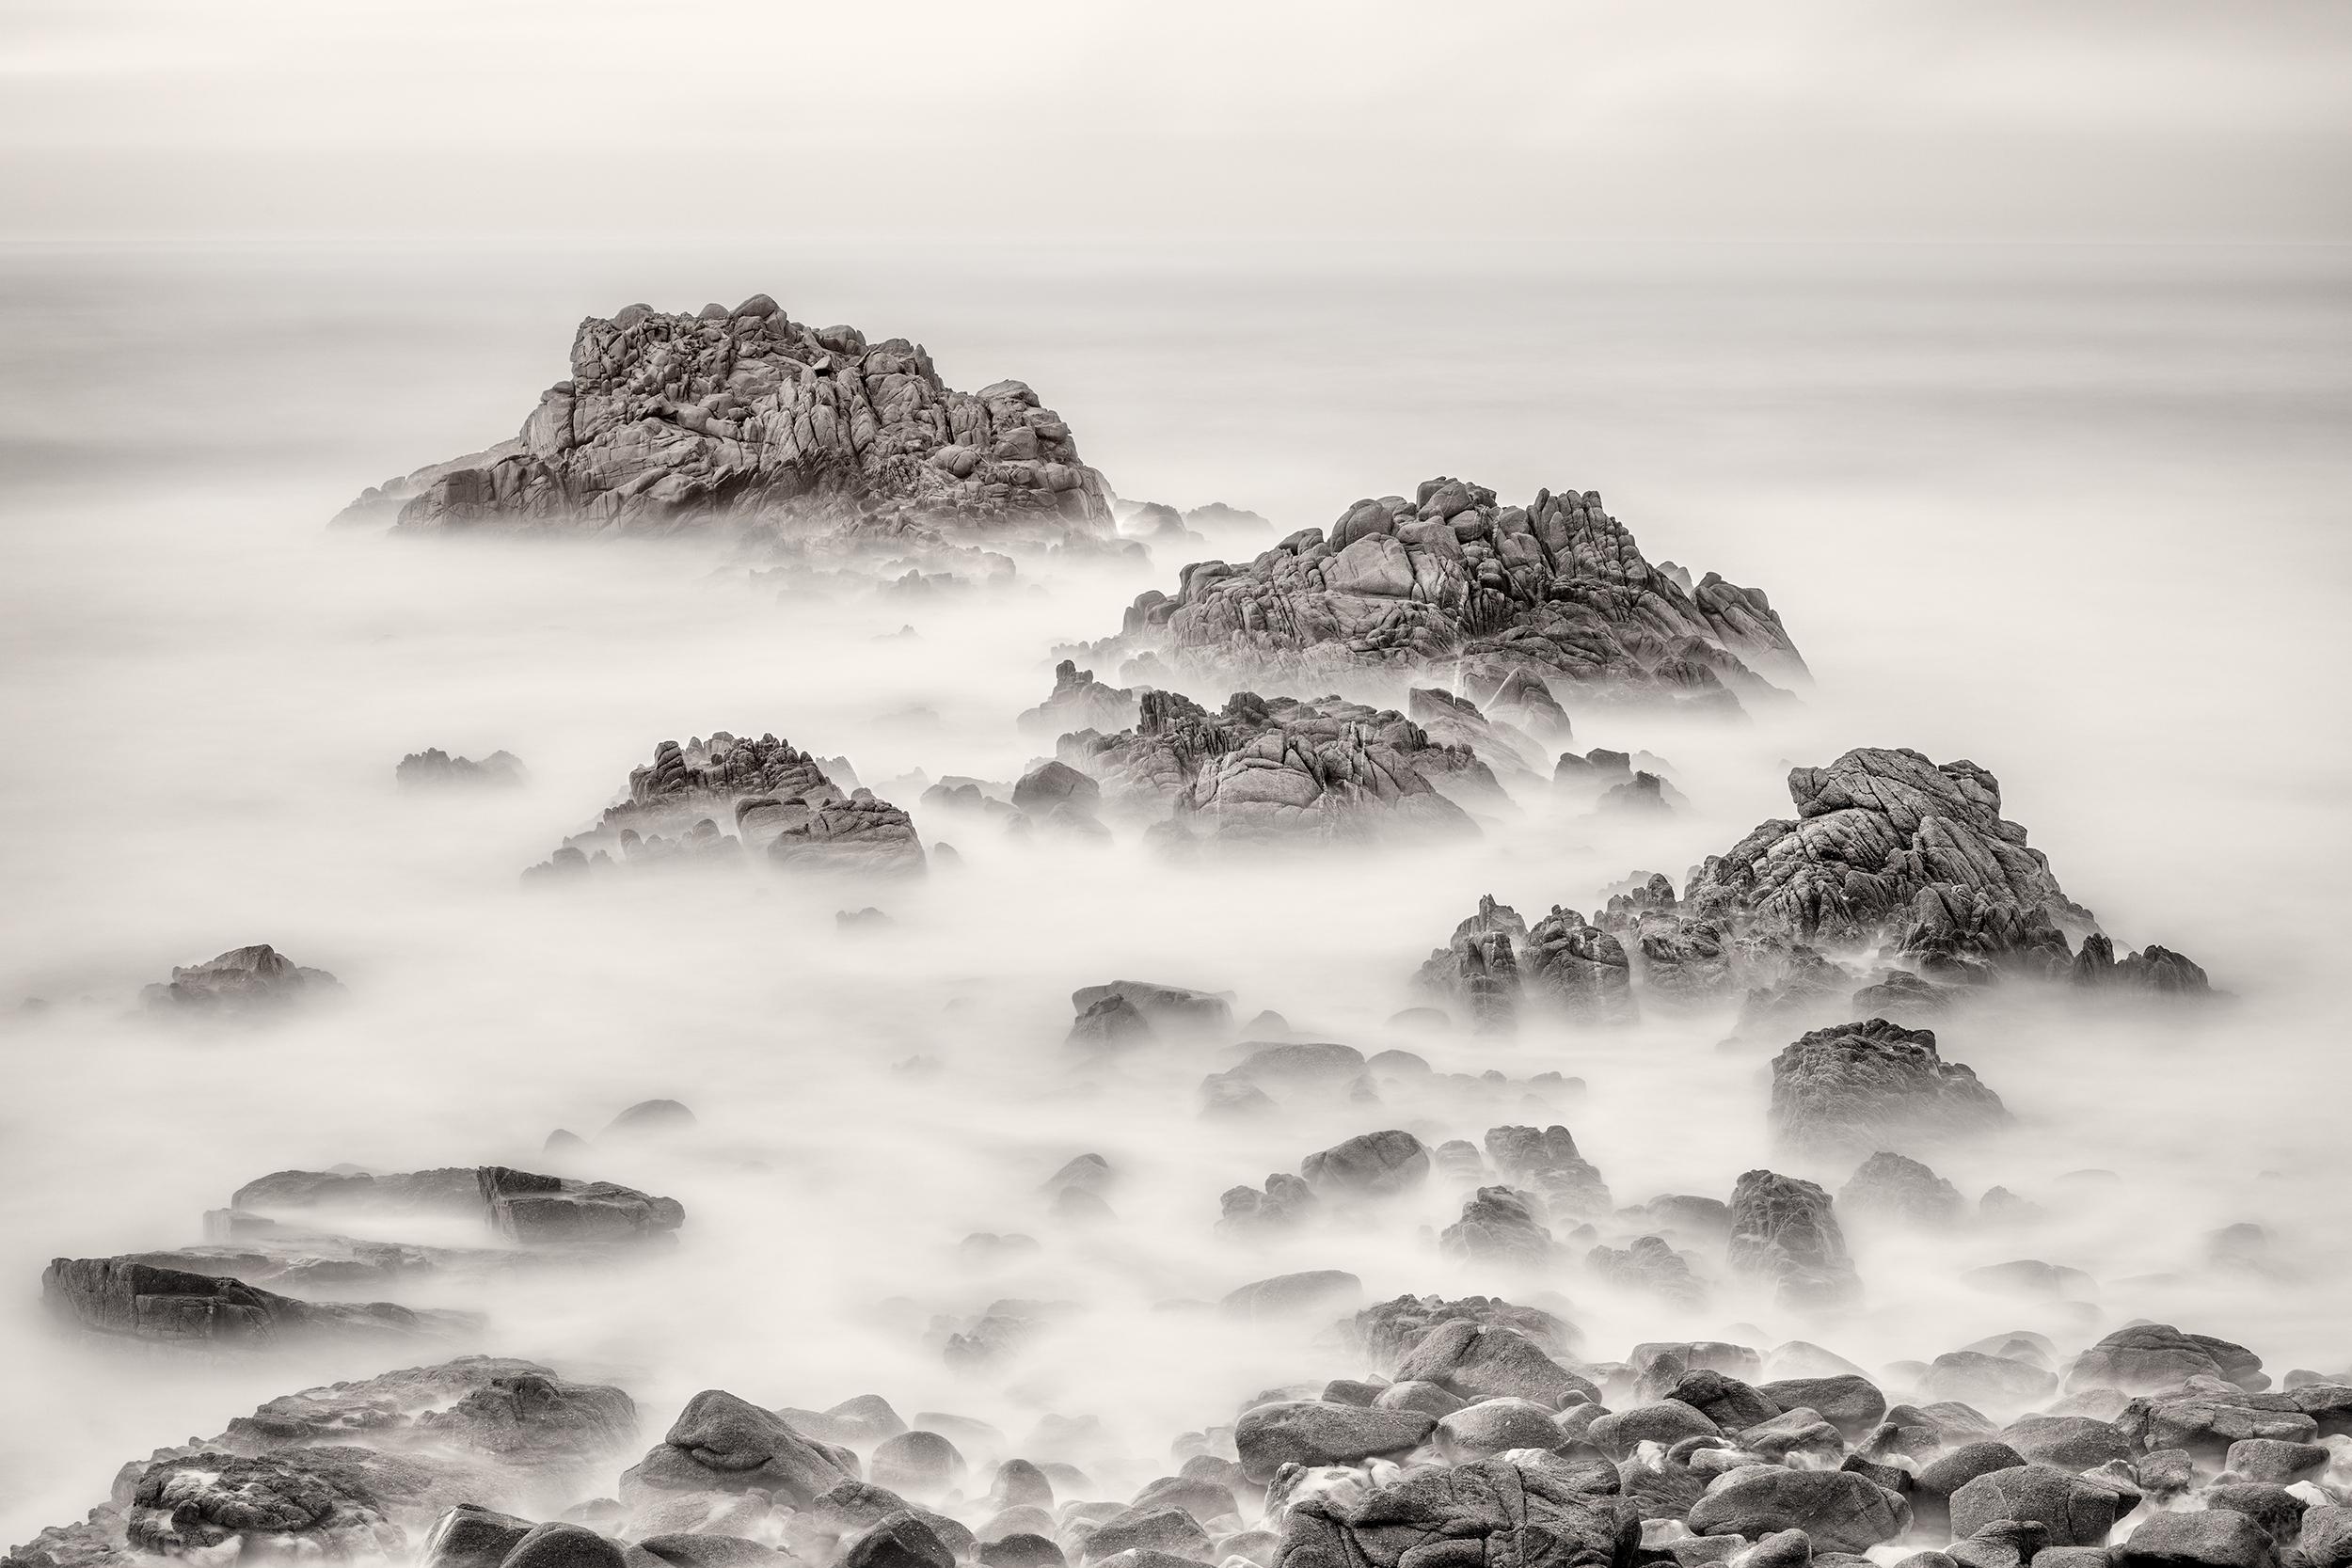 Asilomar Rock Study I - Pacific Grove (BW1914)